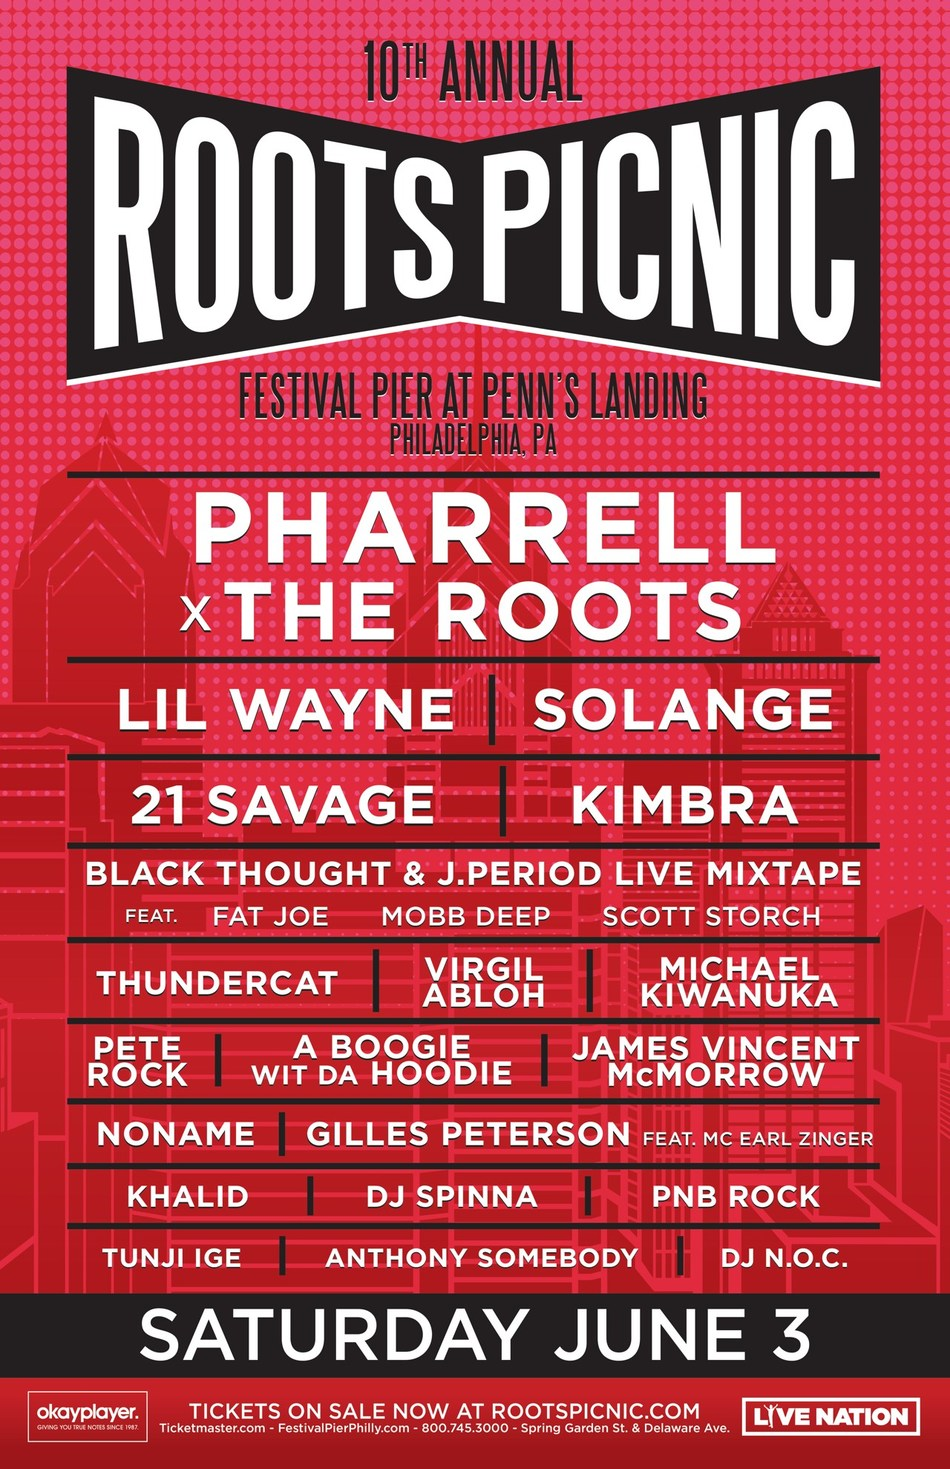 Roots Picnic